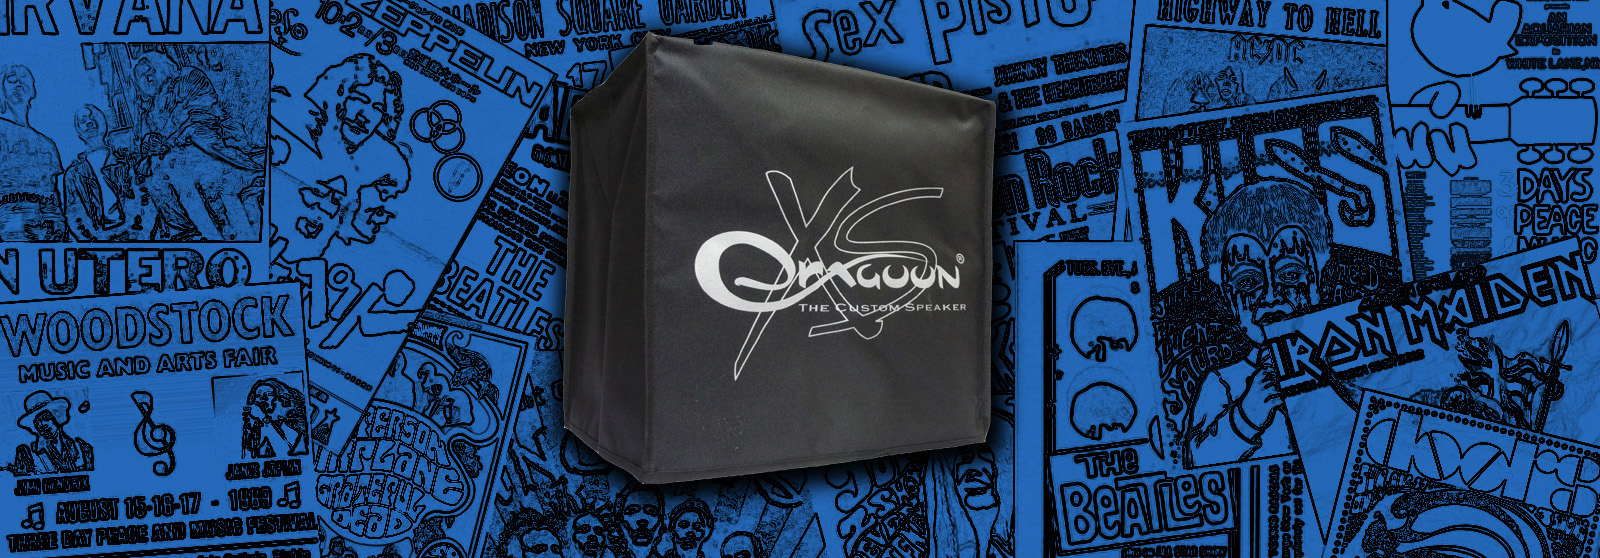 Dragoon - The Custom Speaker - ACCESSORI_2016032917284377544.jpg